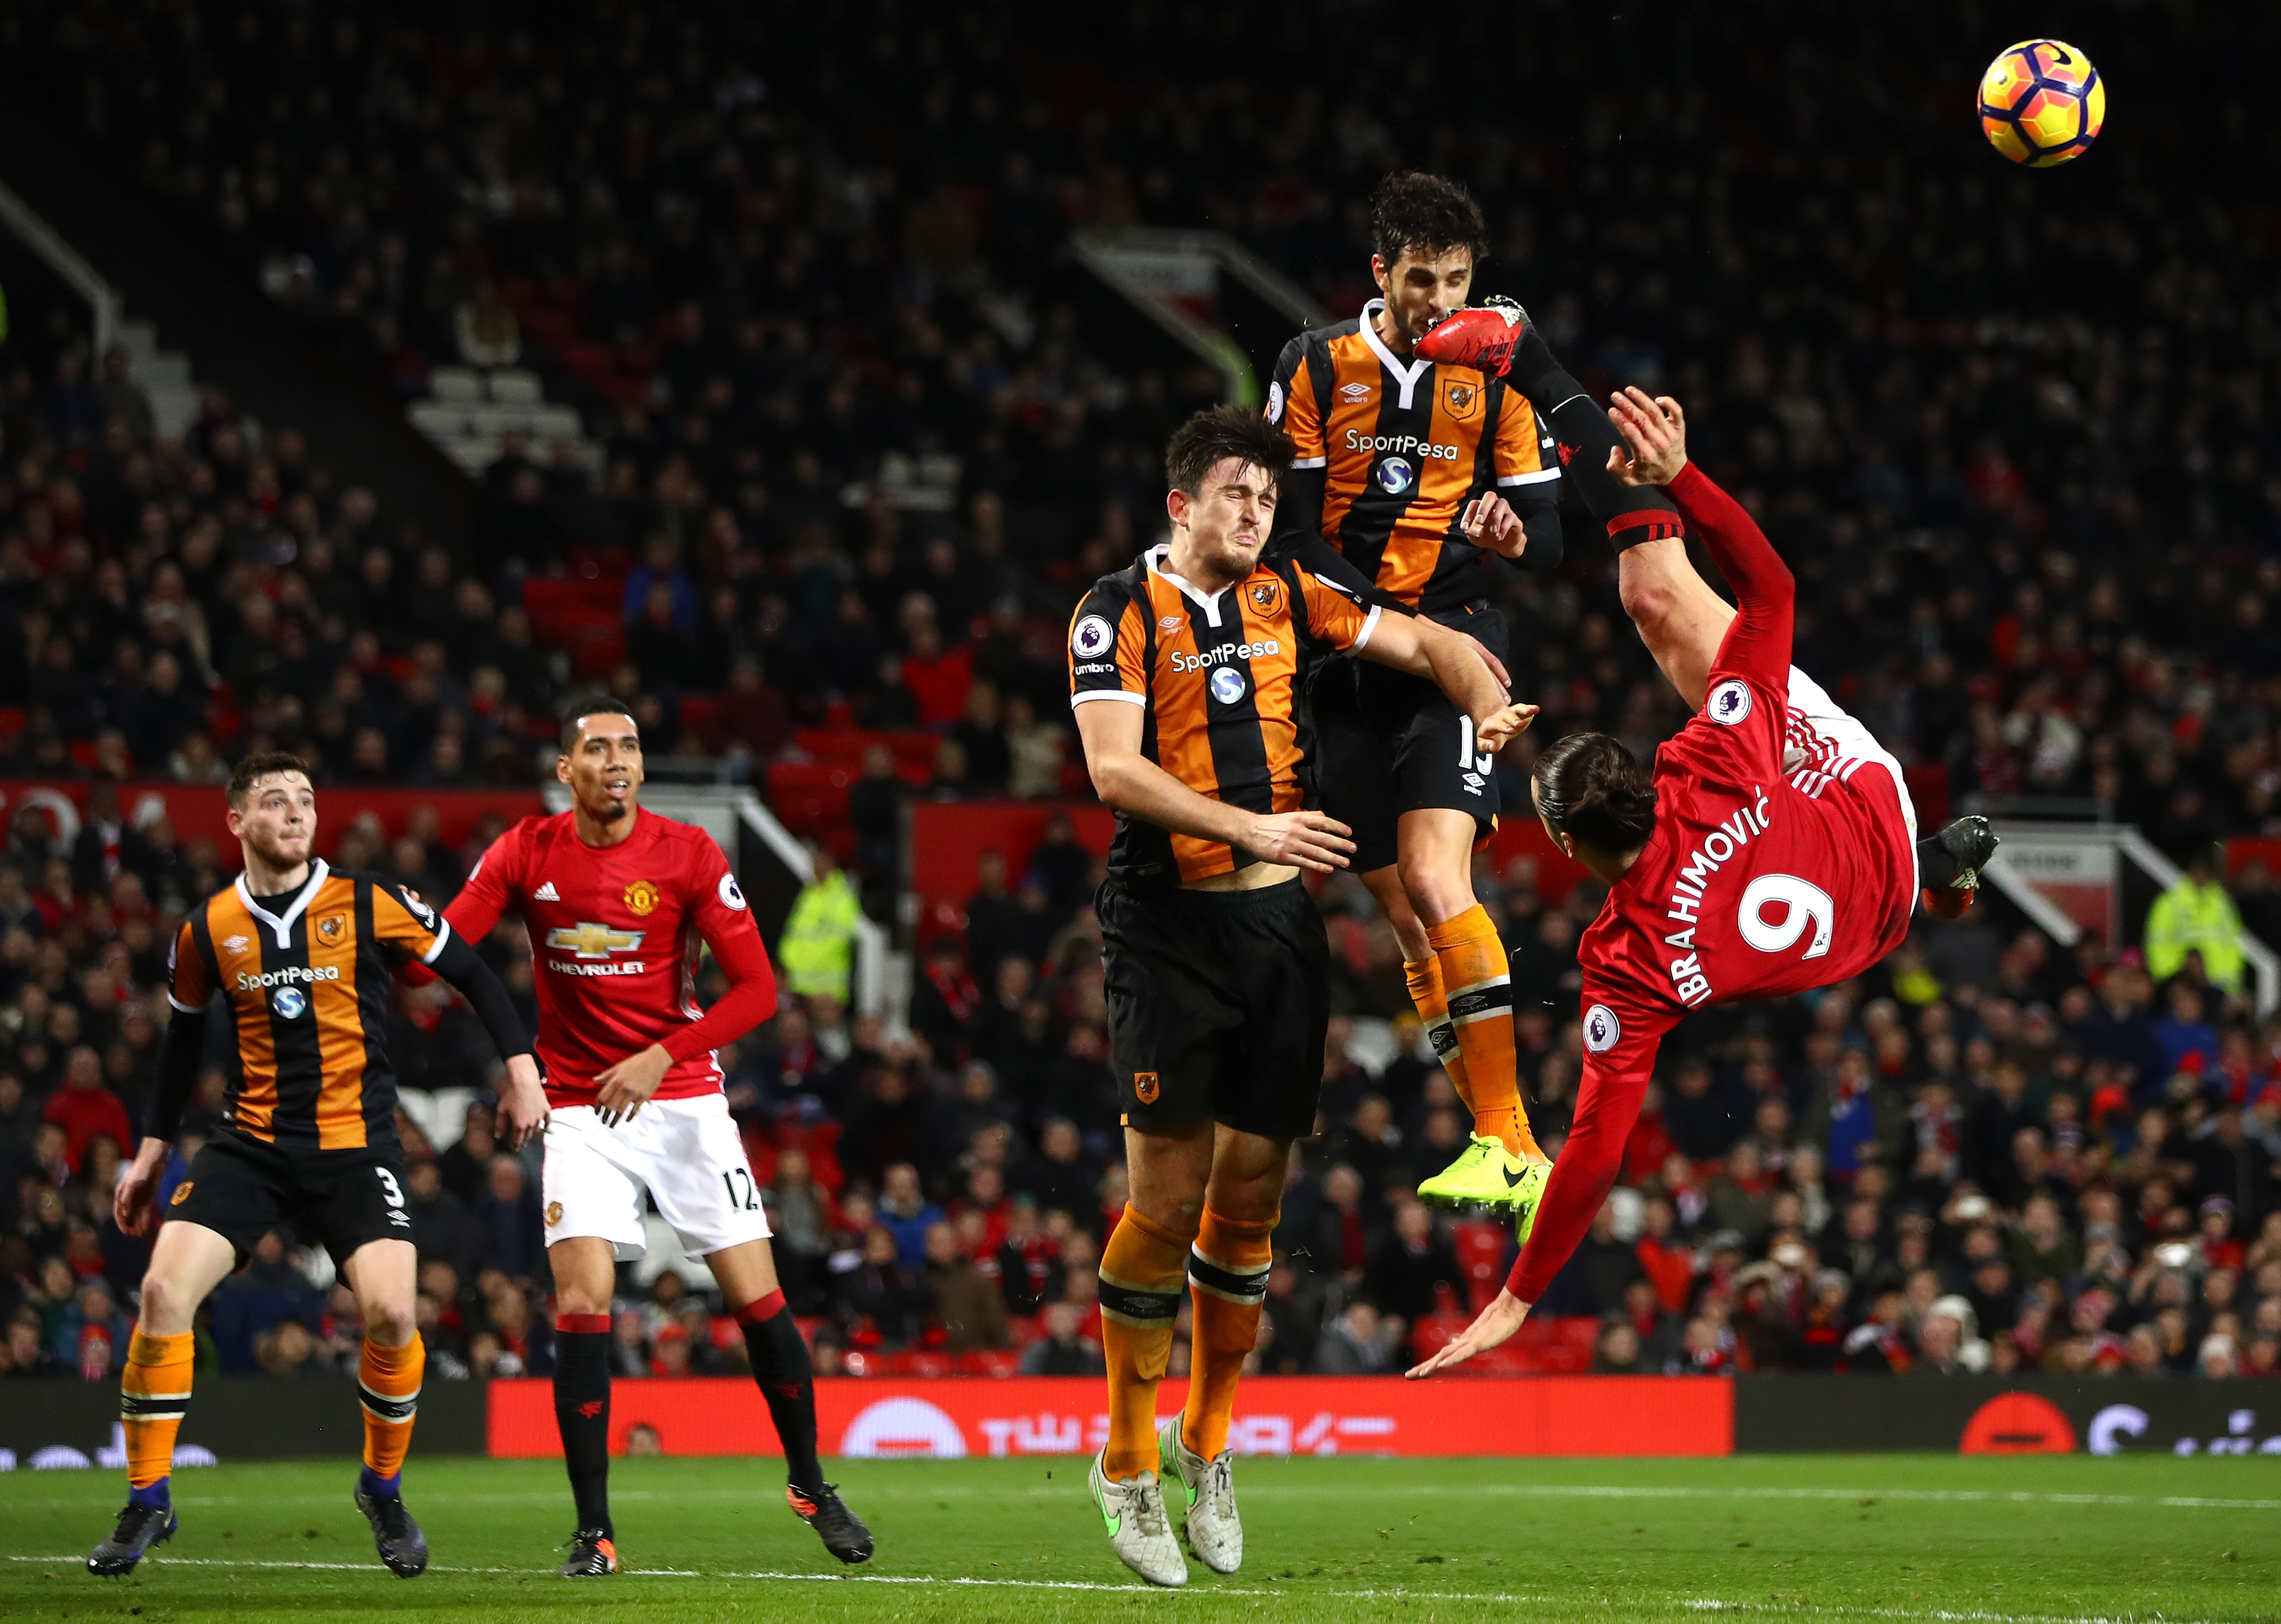 Harry Maguire Andrea Ranocchia Zlatan Ibrahimovic Hull City Manchester United